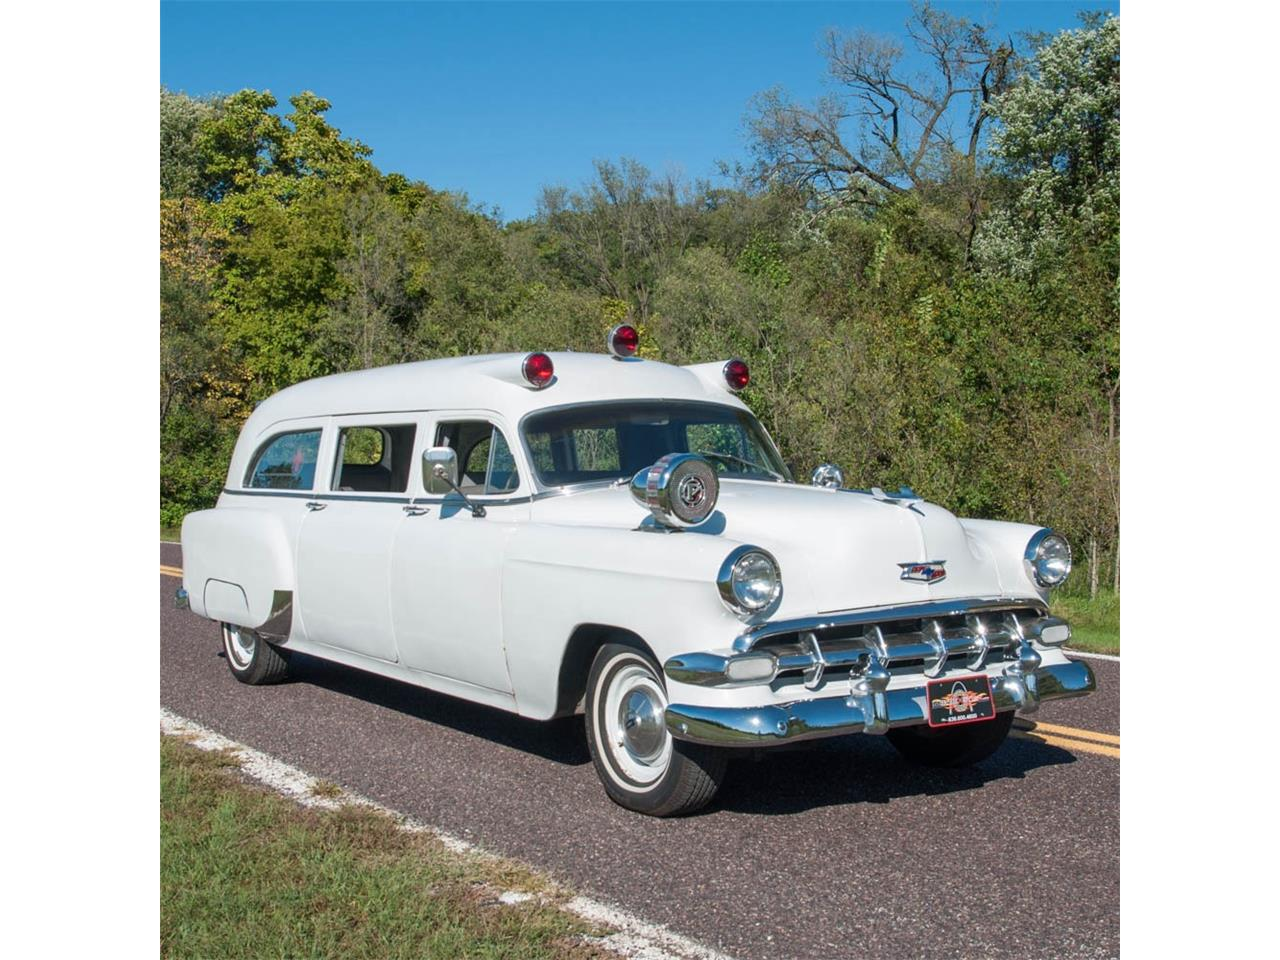 For Sale: 1954 Chevrolet 150 Ambulance in St  Louis, Missouri